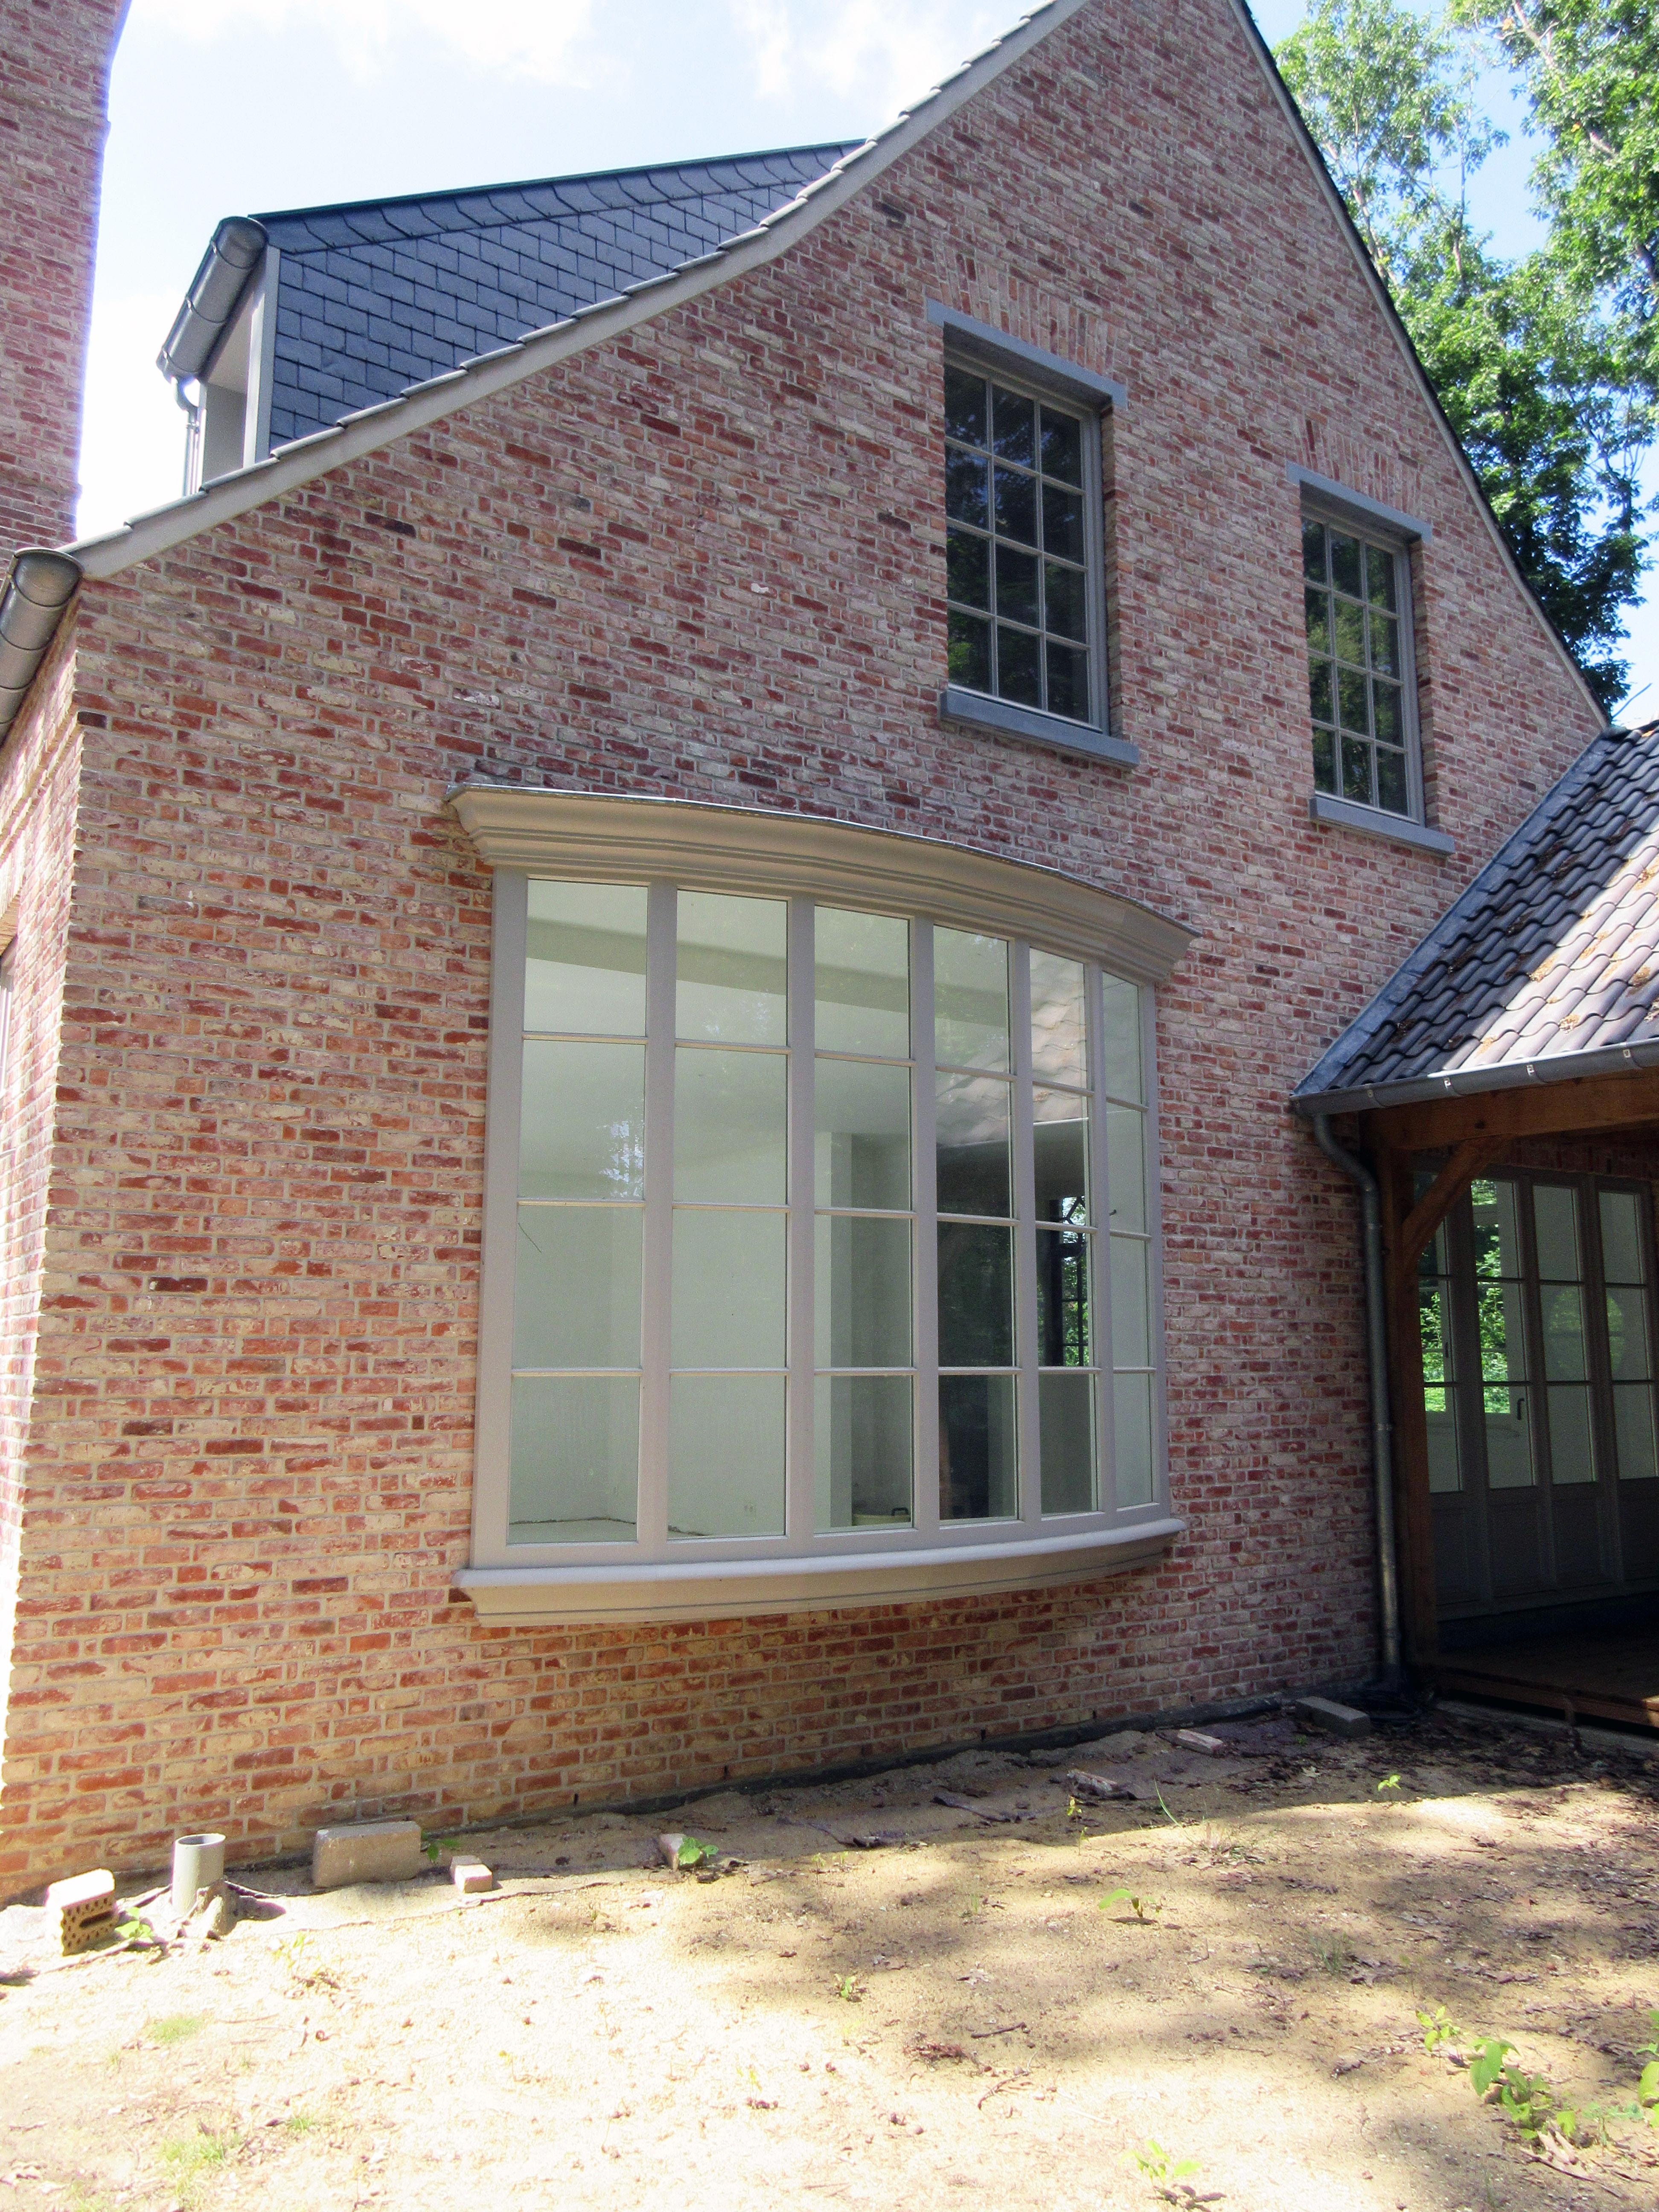 Dry treat brick residence in belgium - Small belgian houses brick ...